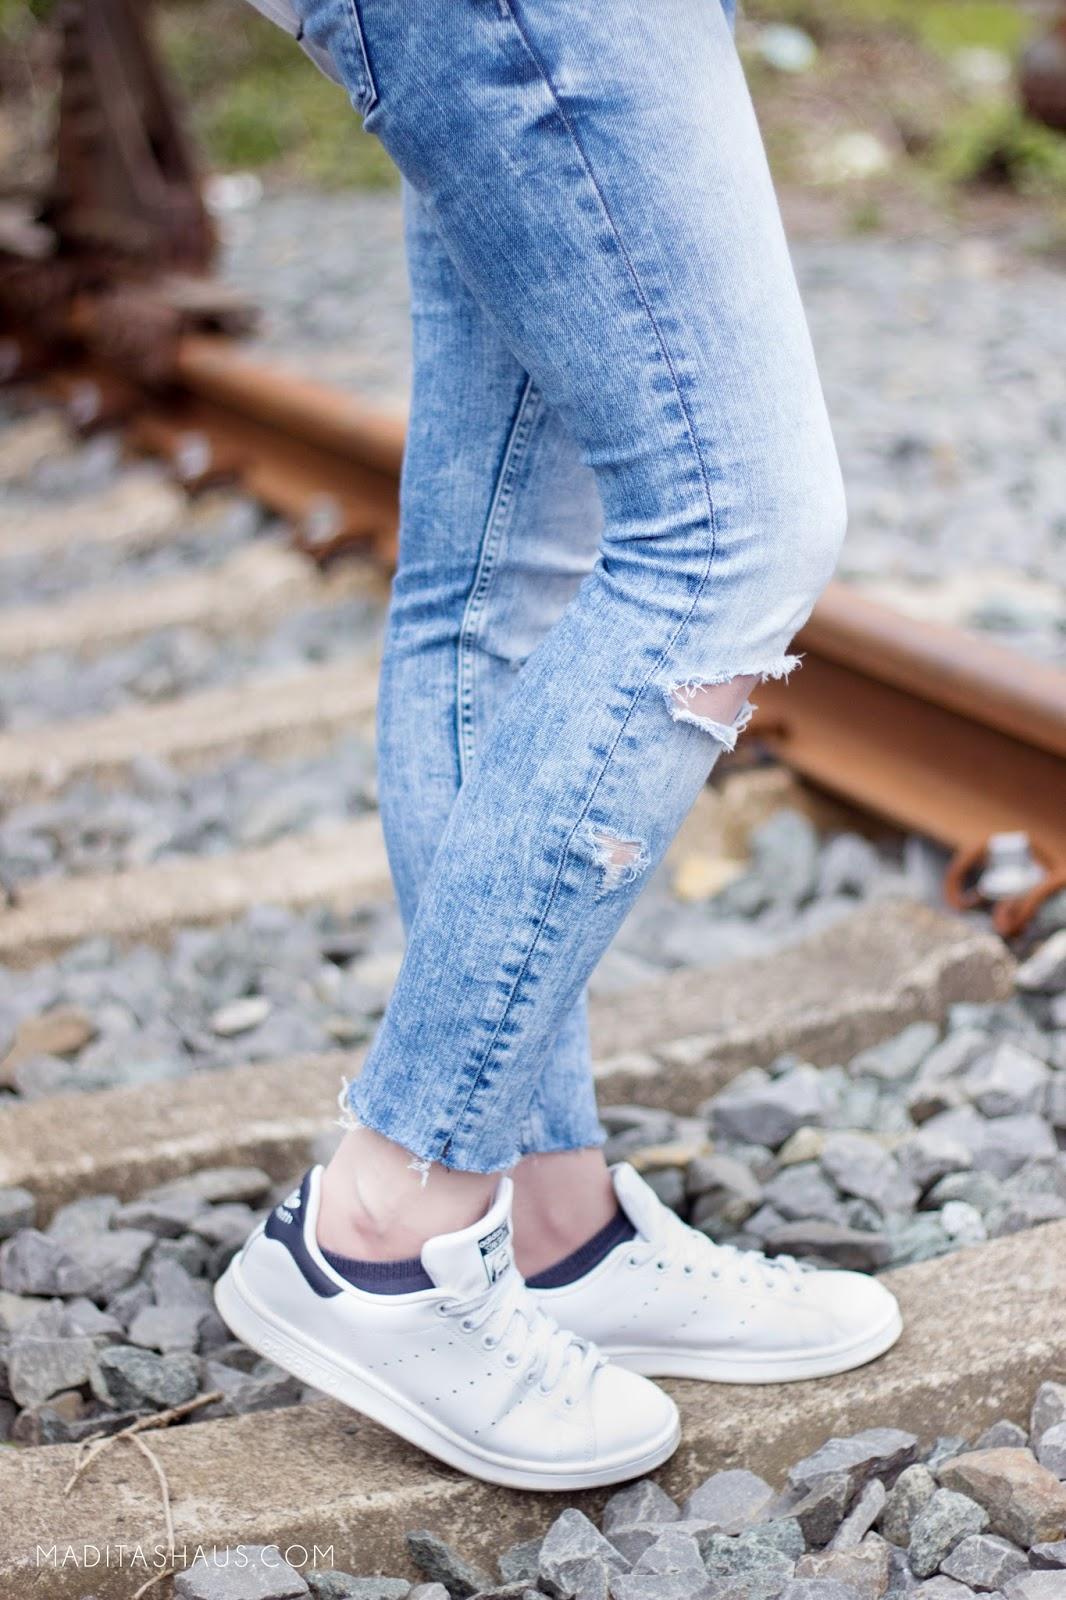 diy destroyed jeans selber machen maditas haus lifestyle und interior blog. Black Bedroom Furniture Sets. Home Design Ideas